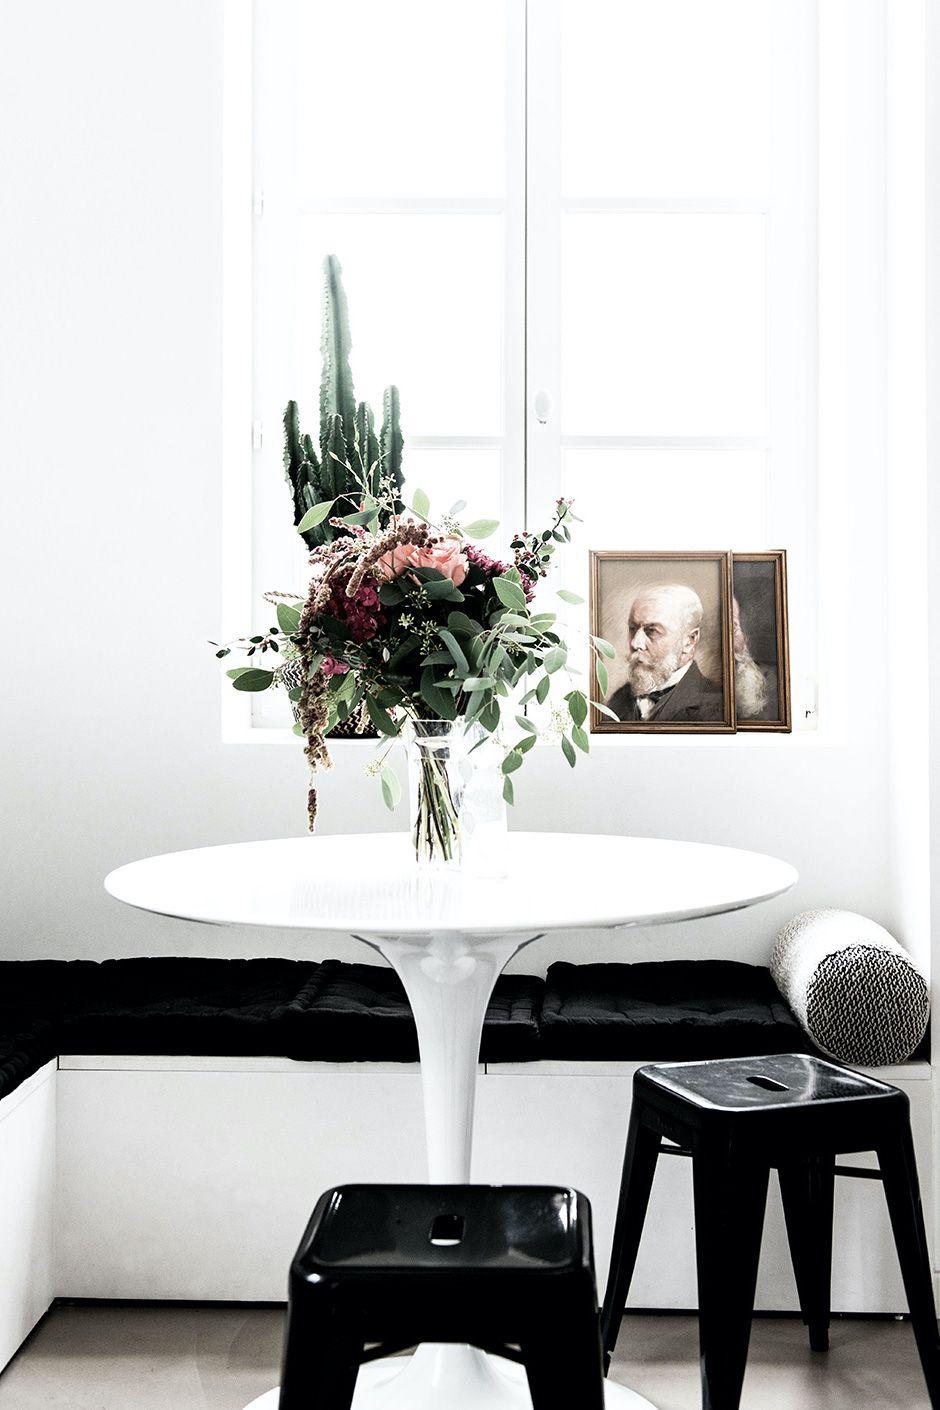 Breakfast nook with flowers